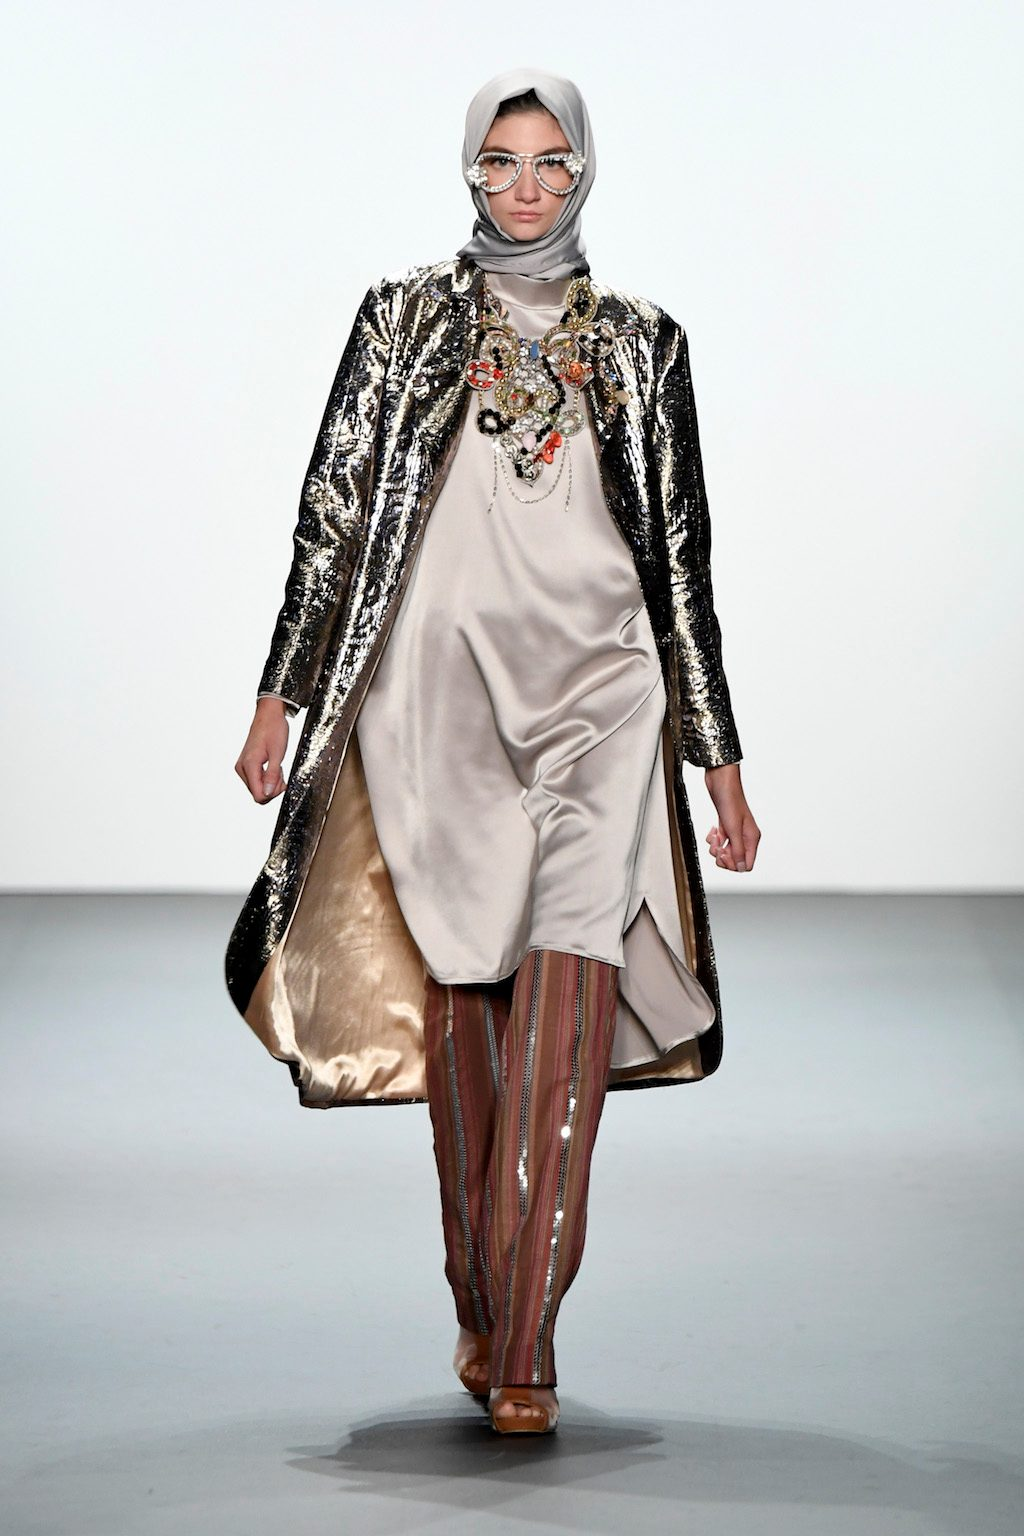 NYFW Spring 2017 Recap • The Fashion Fuse